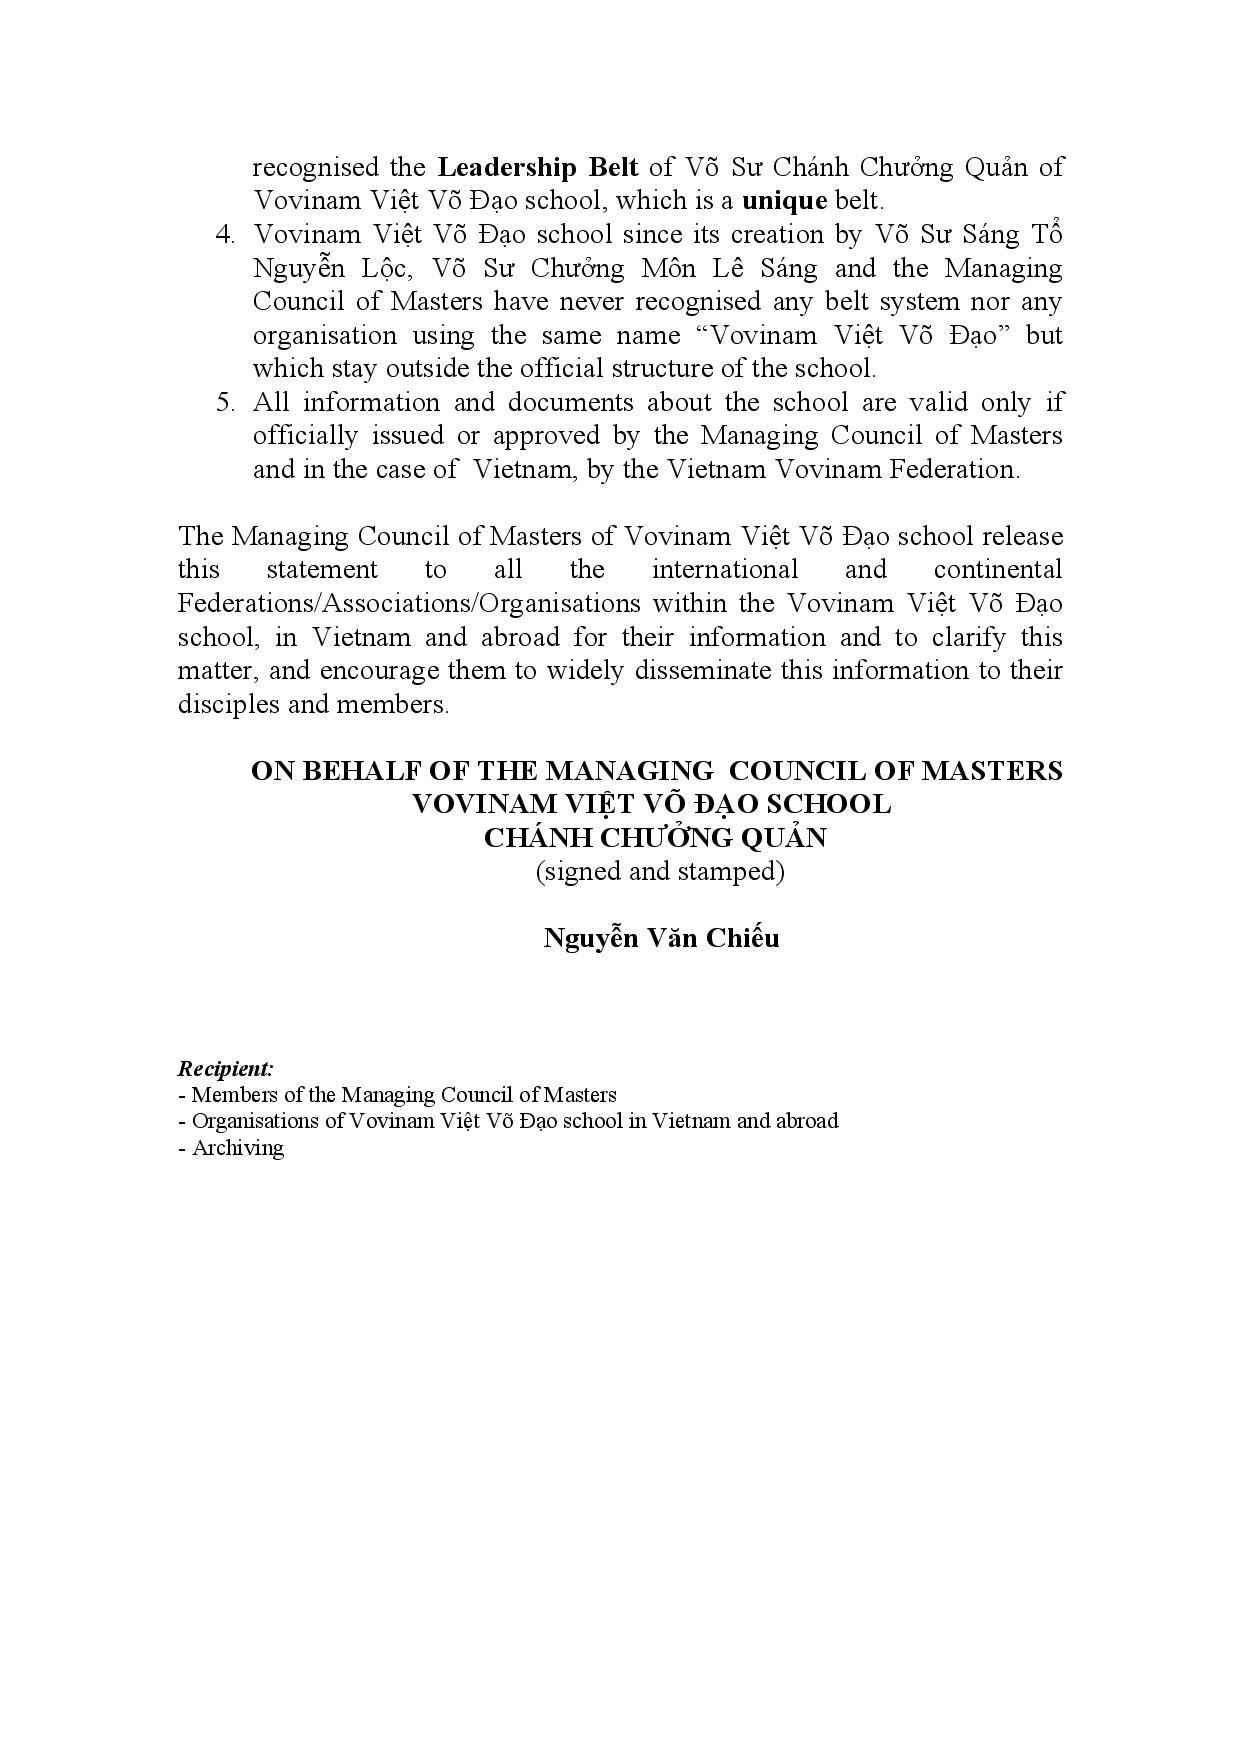 CAO TRI HDVSCQMP 2016 - STATEMENT-page-004